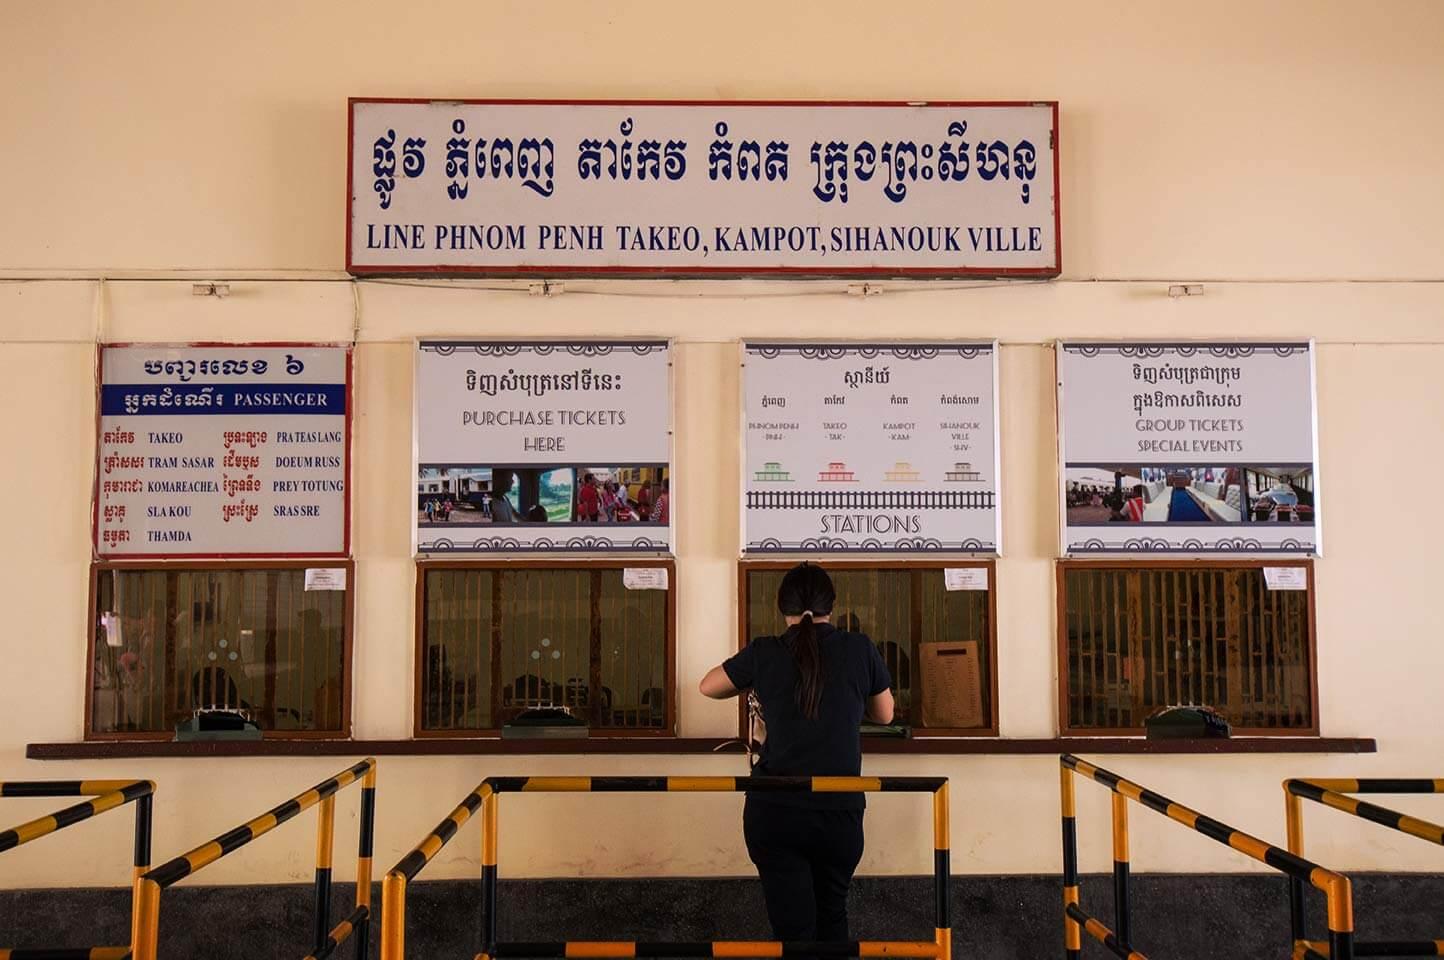 Schalter - Bahnhof Phnom Penh